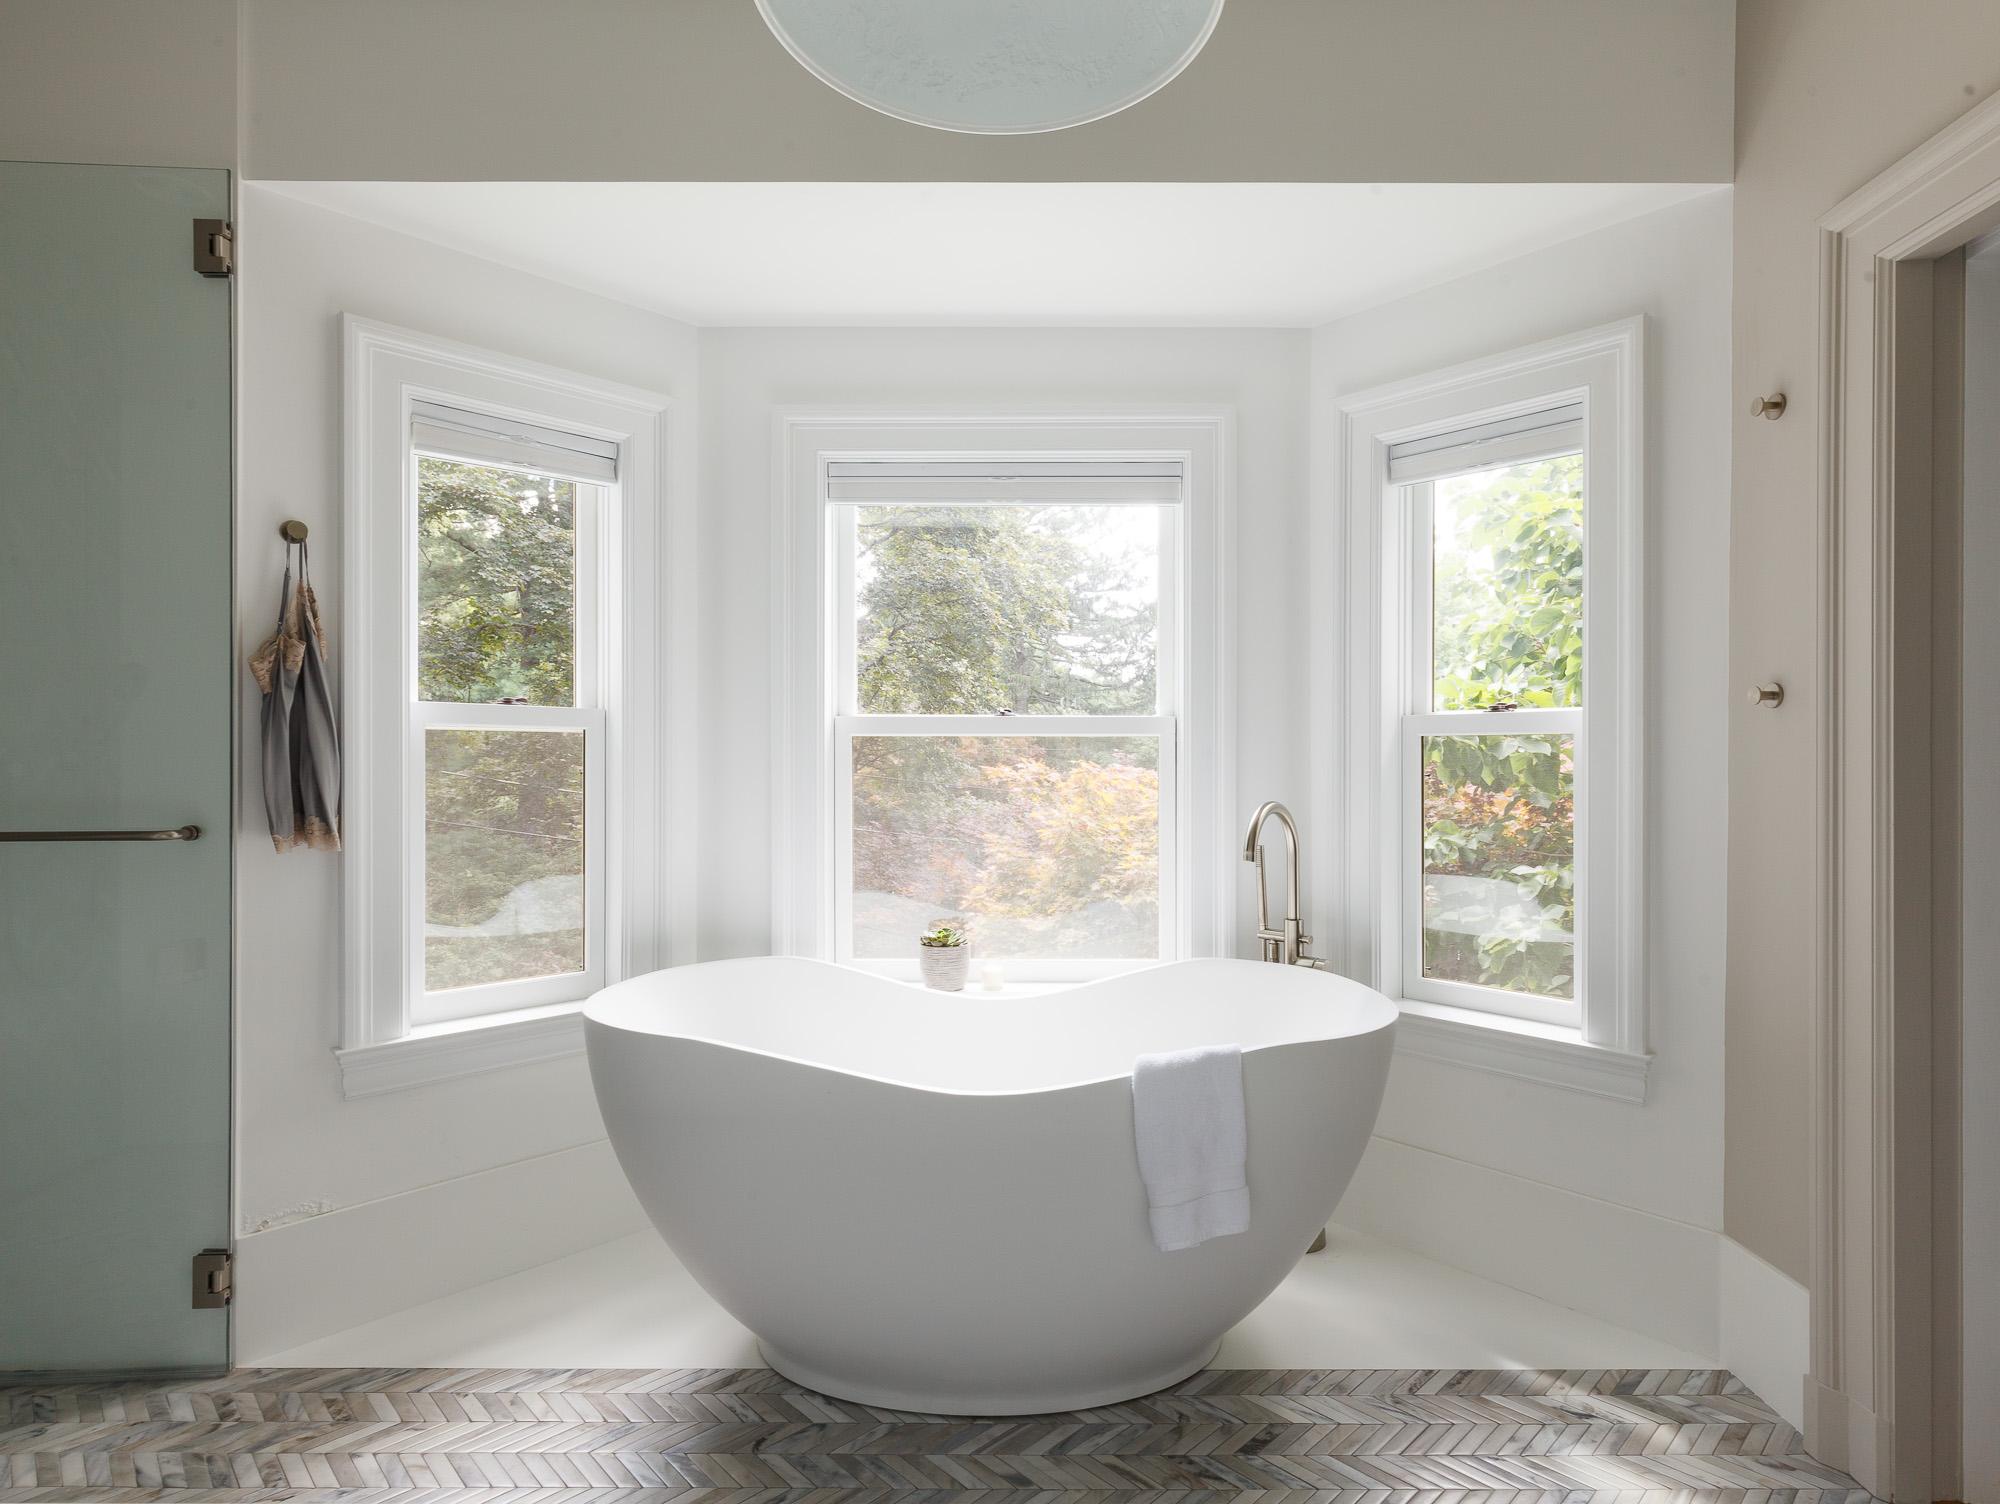 06 M Bath_MG_ 0252.jpg